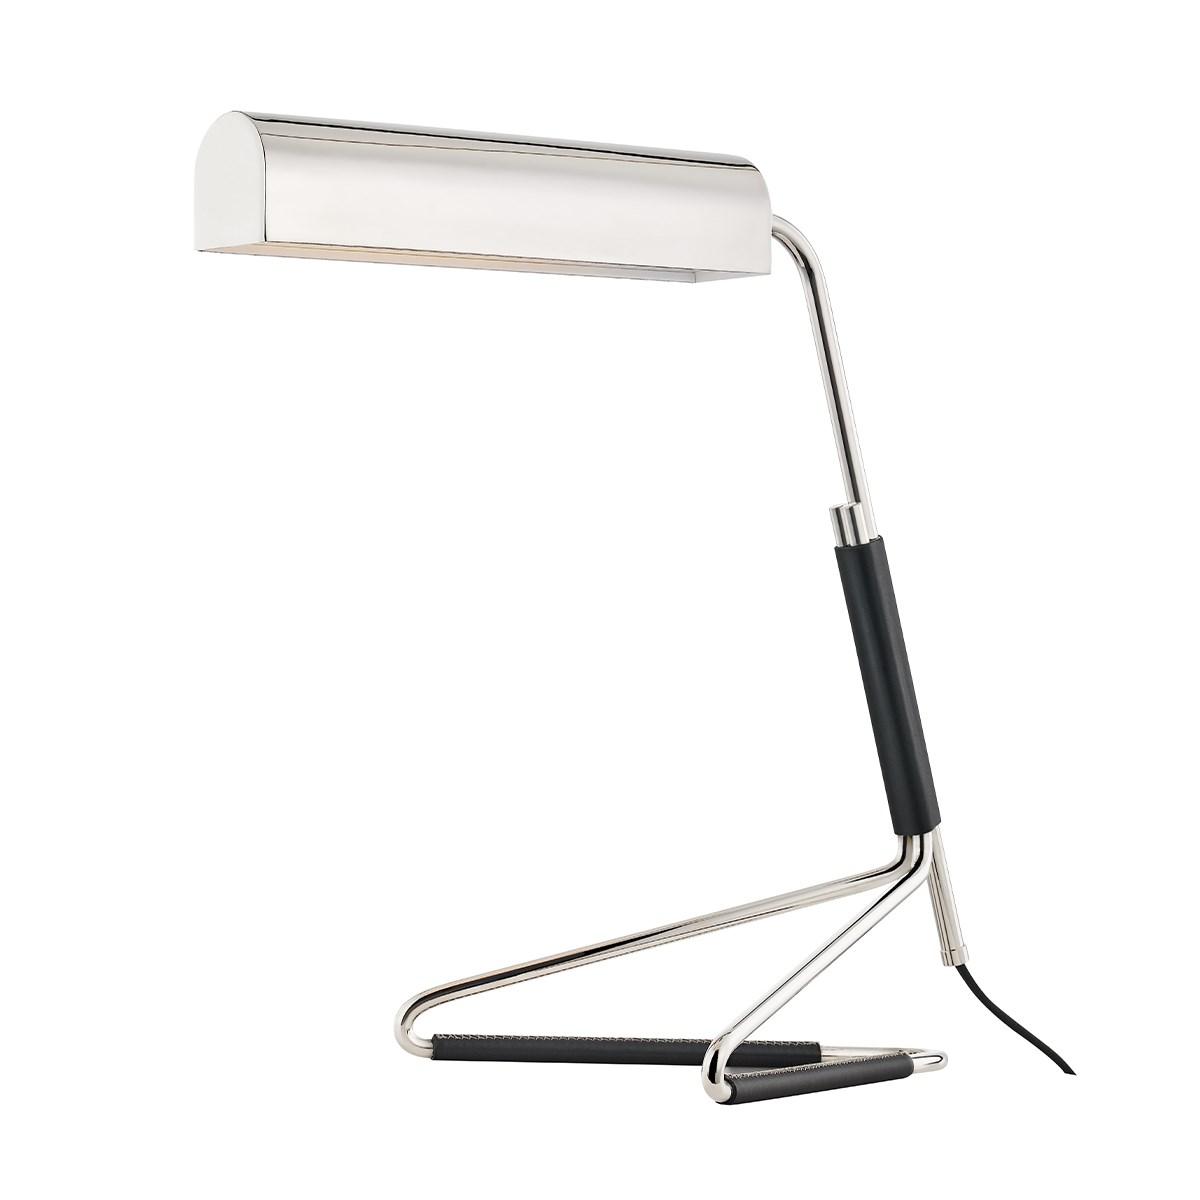 Vance Table Lamp